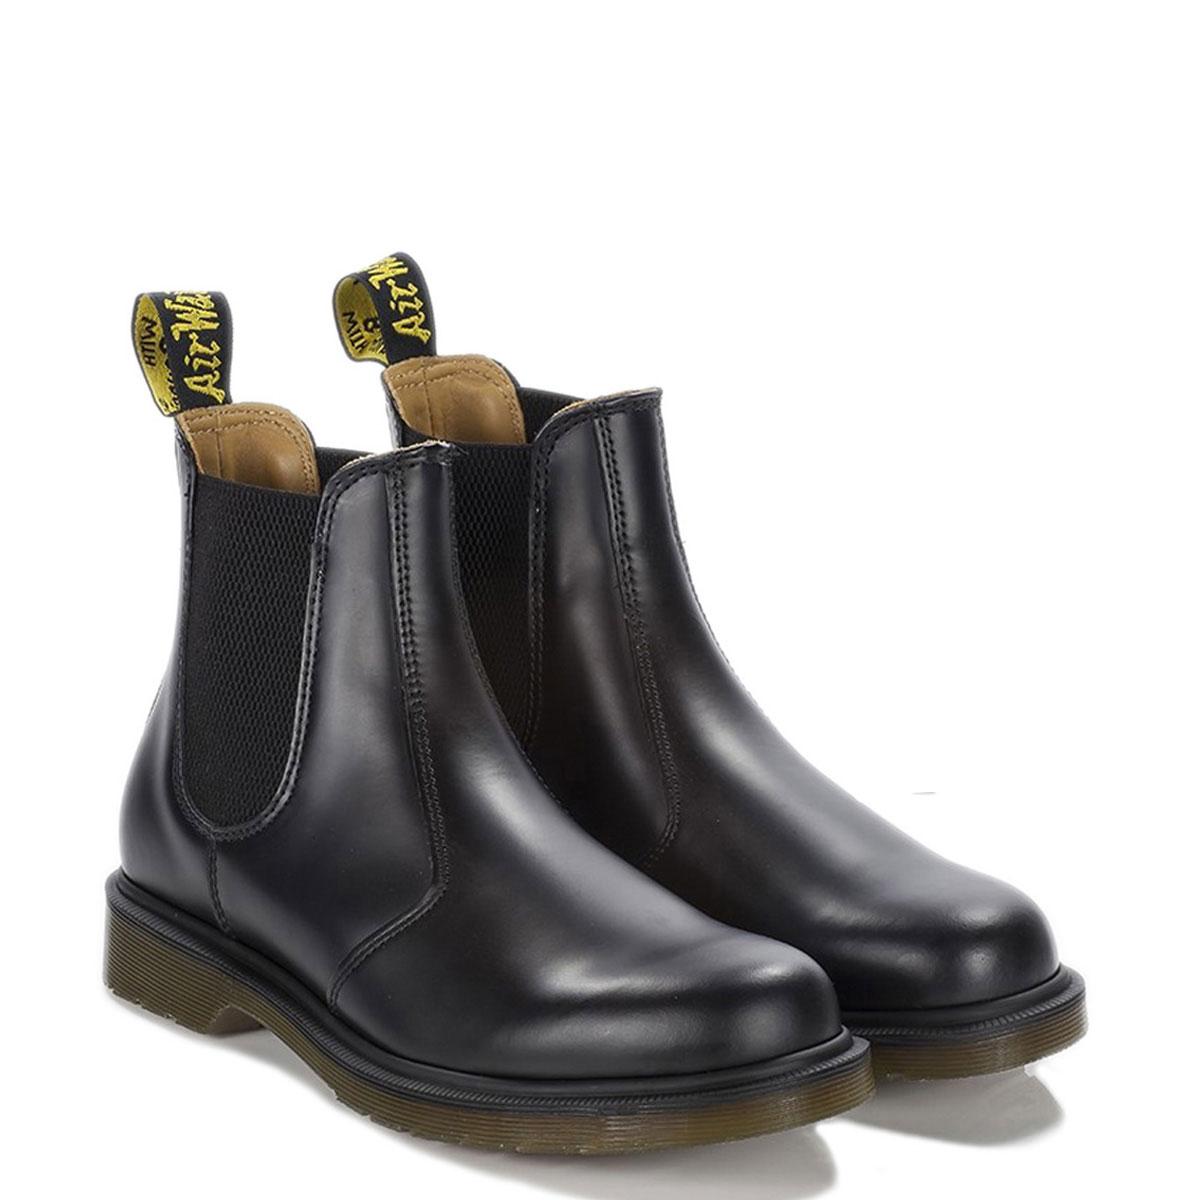 Dr.Martens CHELSEA BOOT R11853001 サイドゴア 2976 メンズ レディース ドクターマーチン チェルシー ブーツ